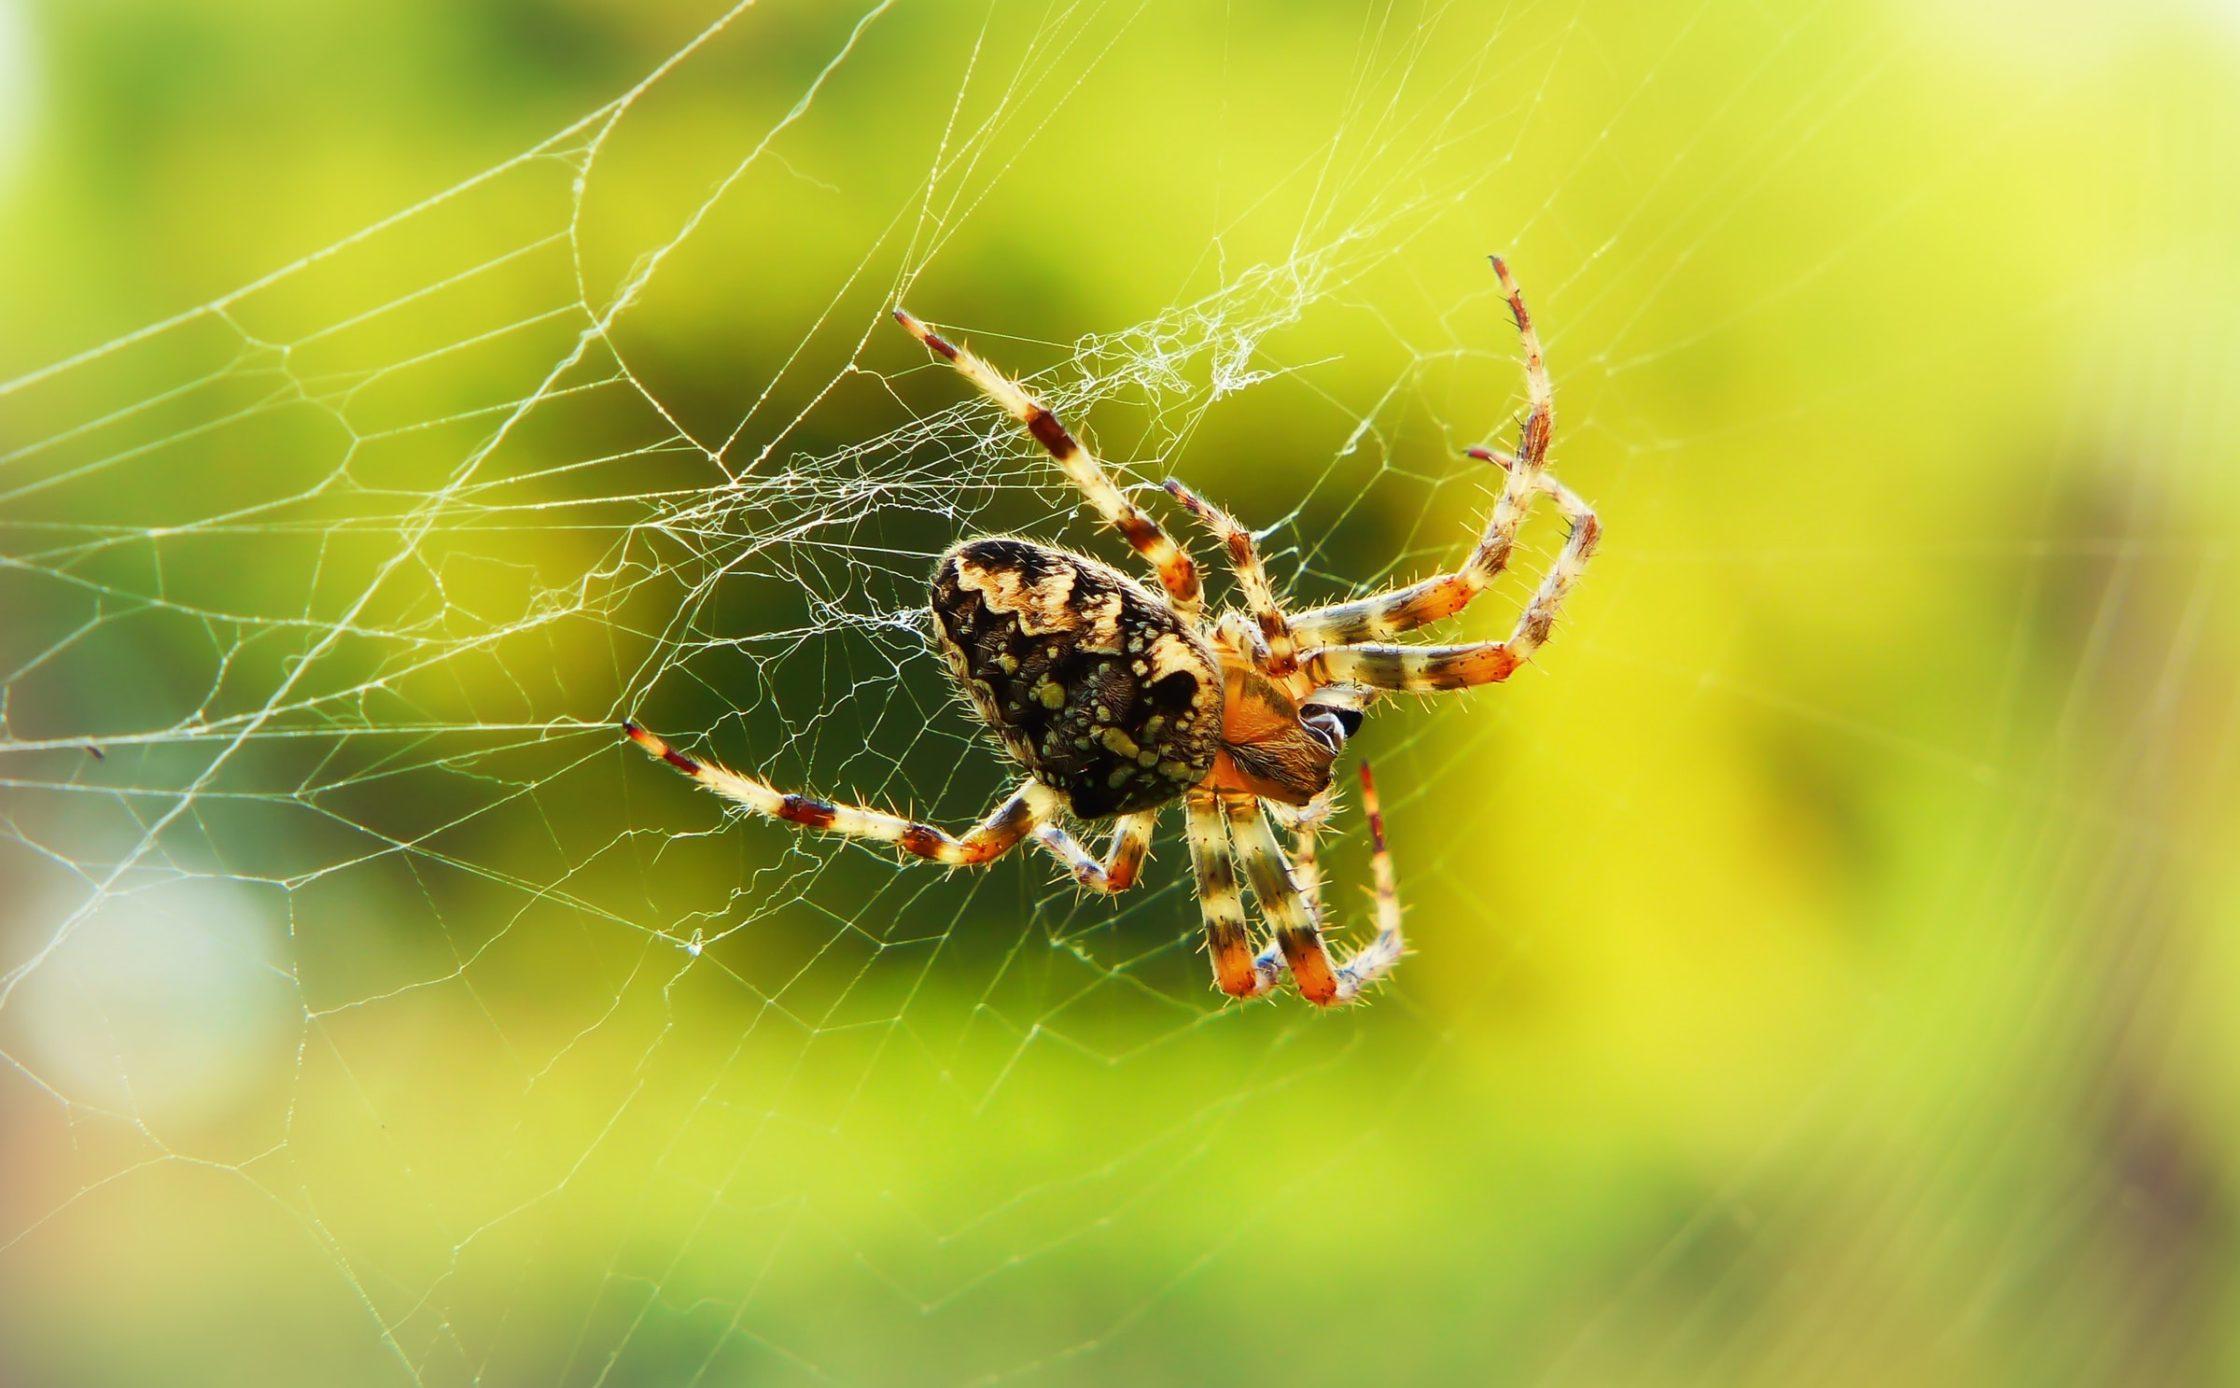 spider spiderweb up close